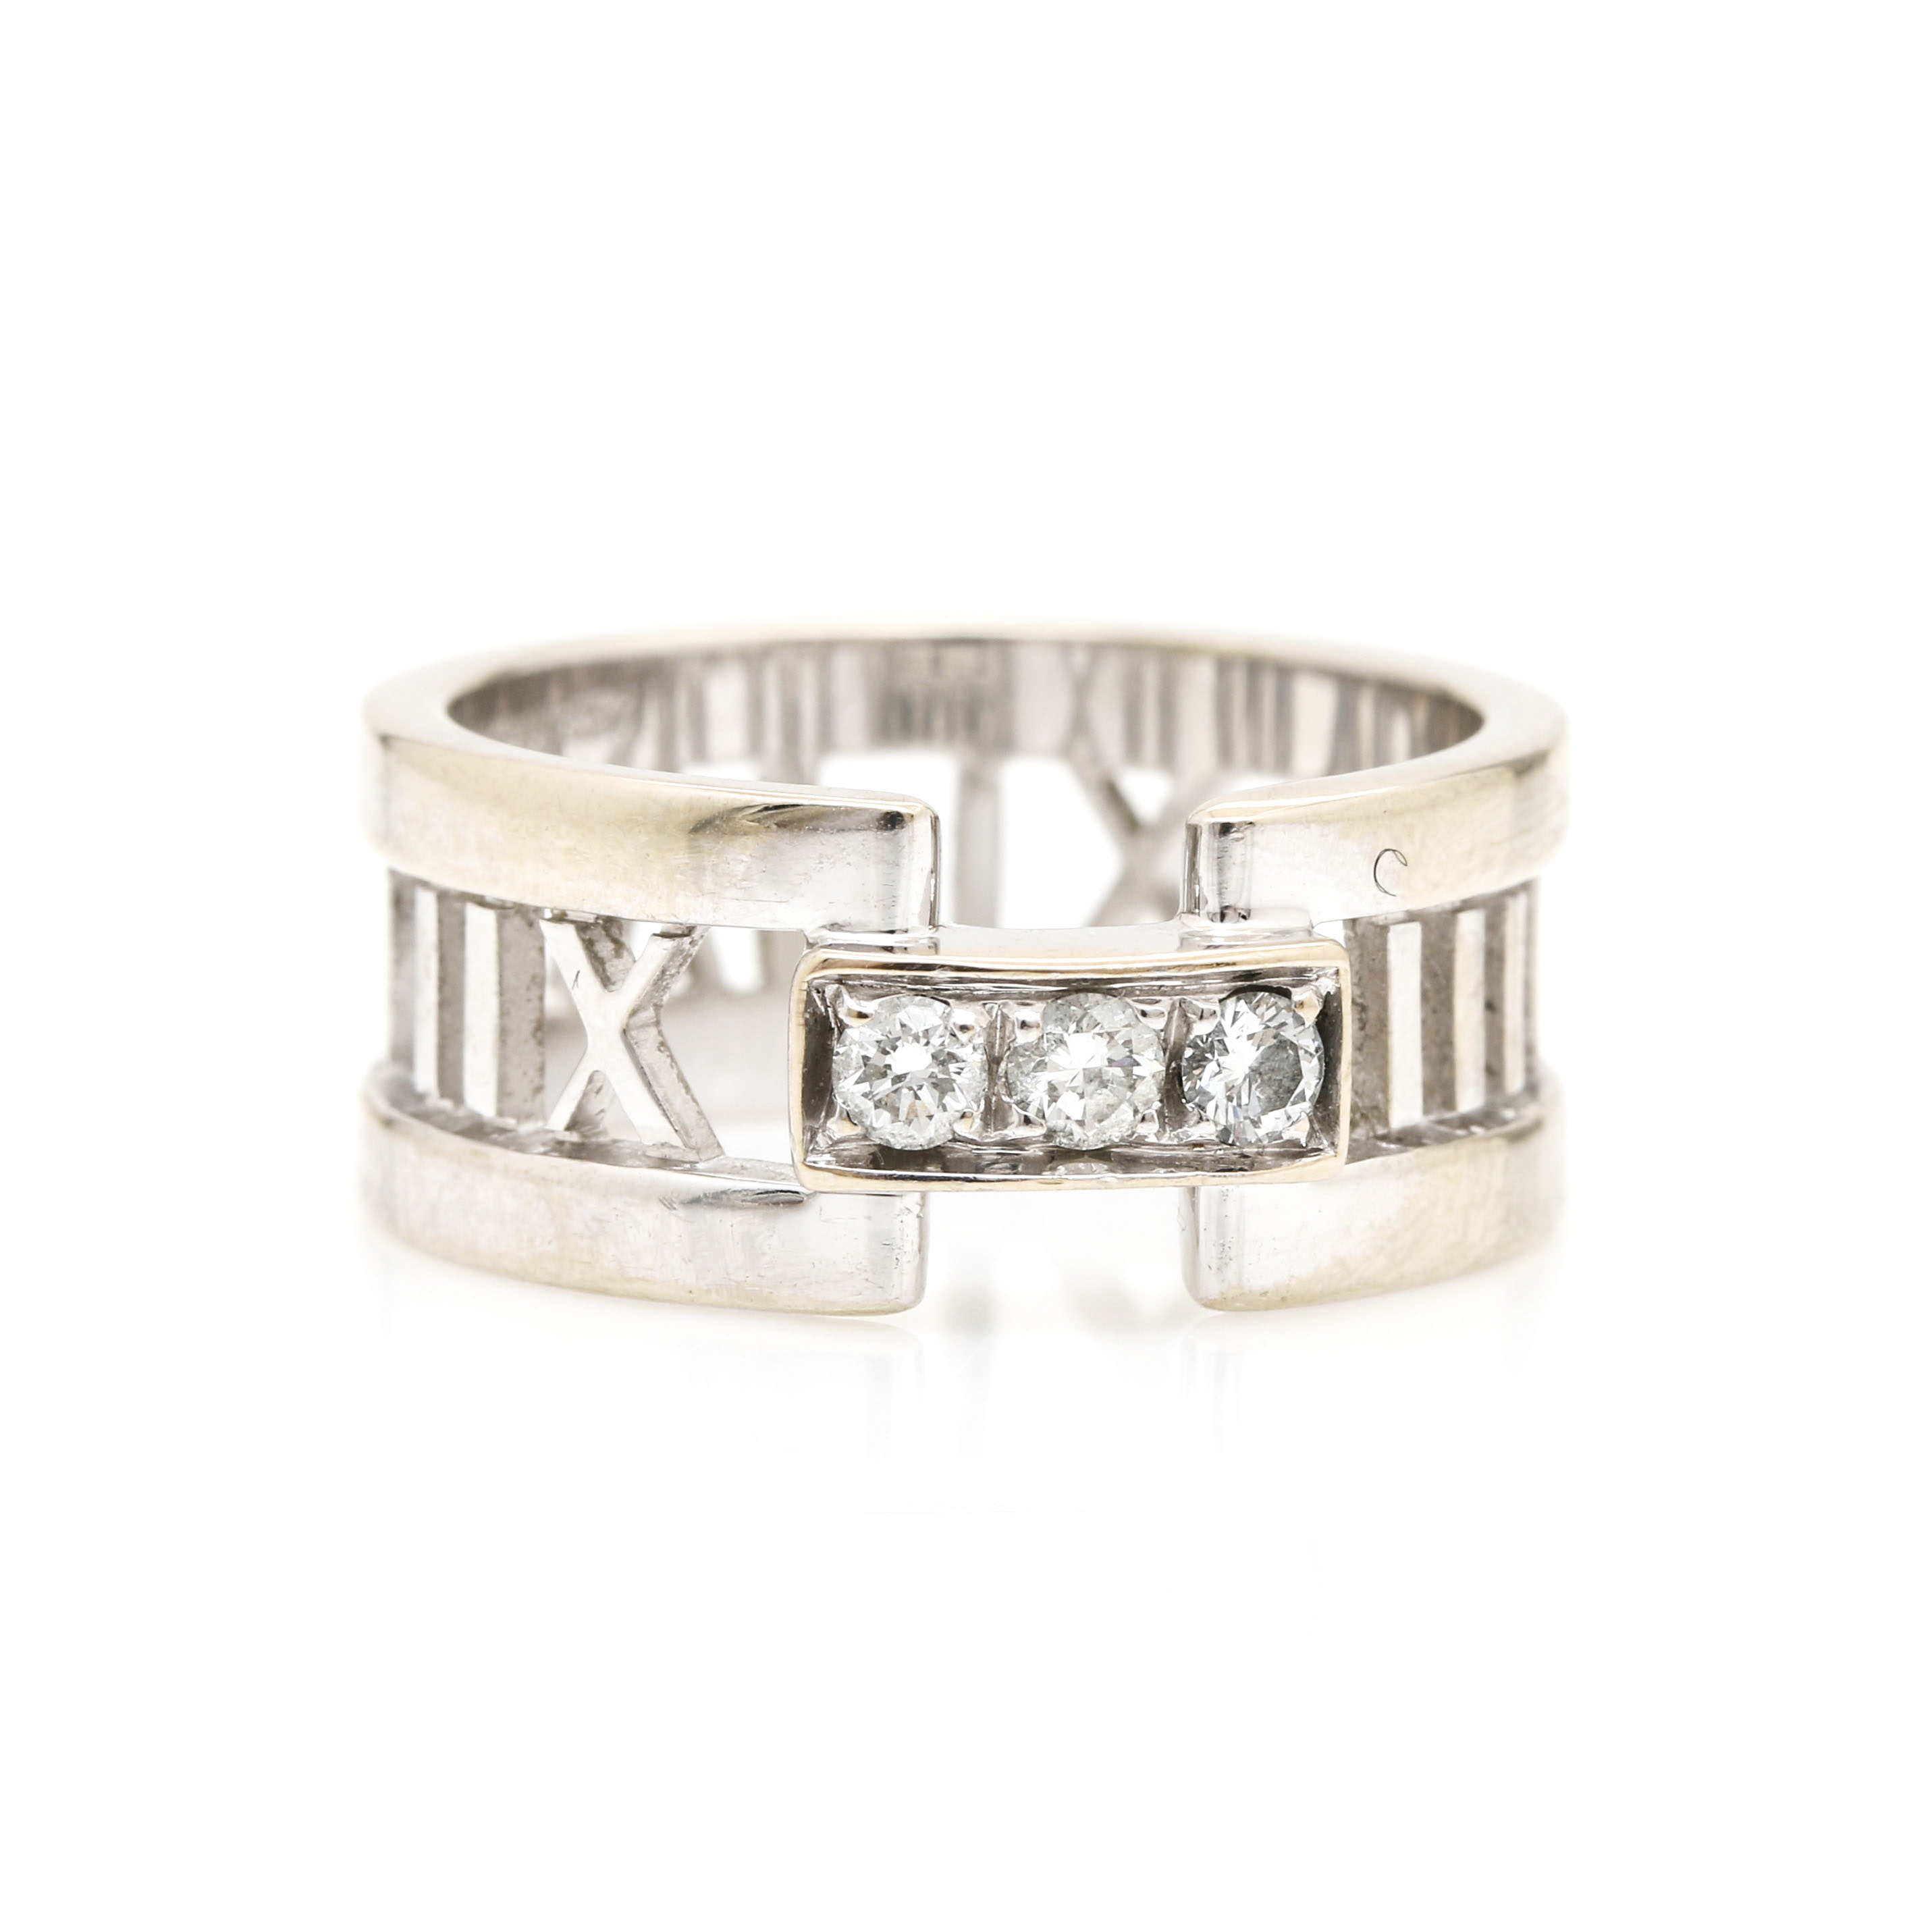 "Tiffany & Co. ""Atlas"" 18K White Gold Diamond Ring"